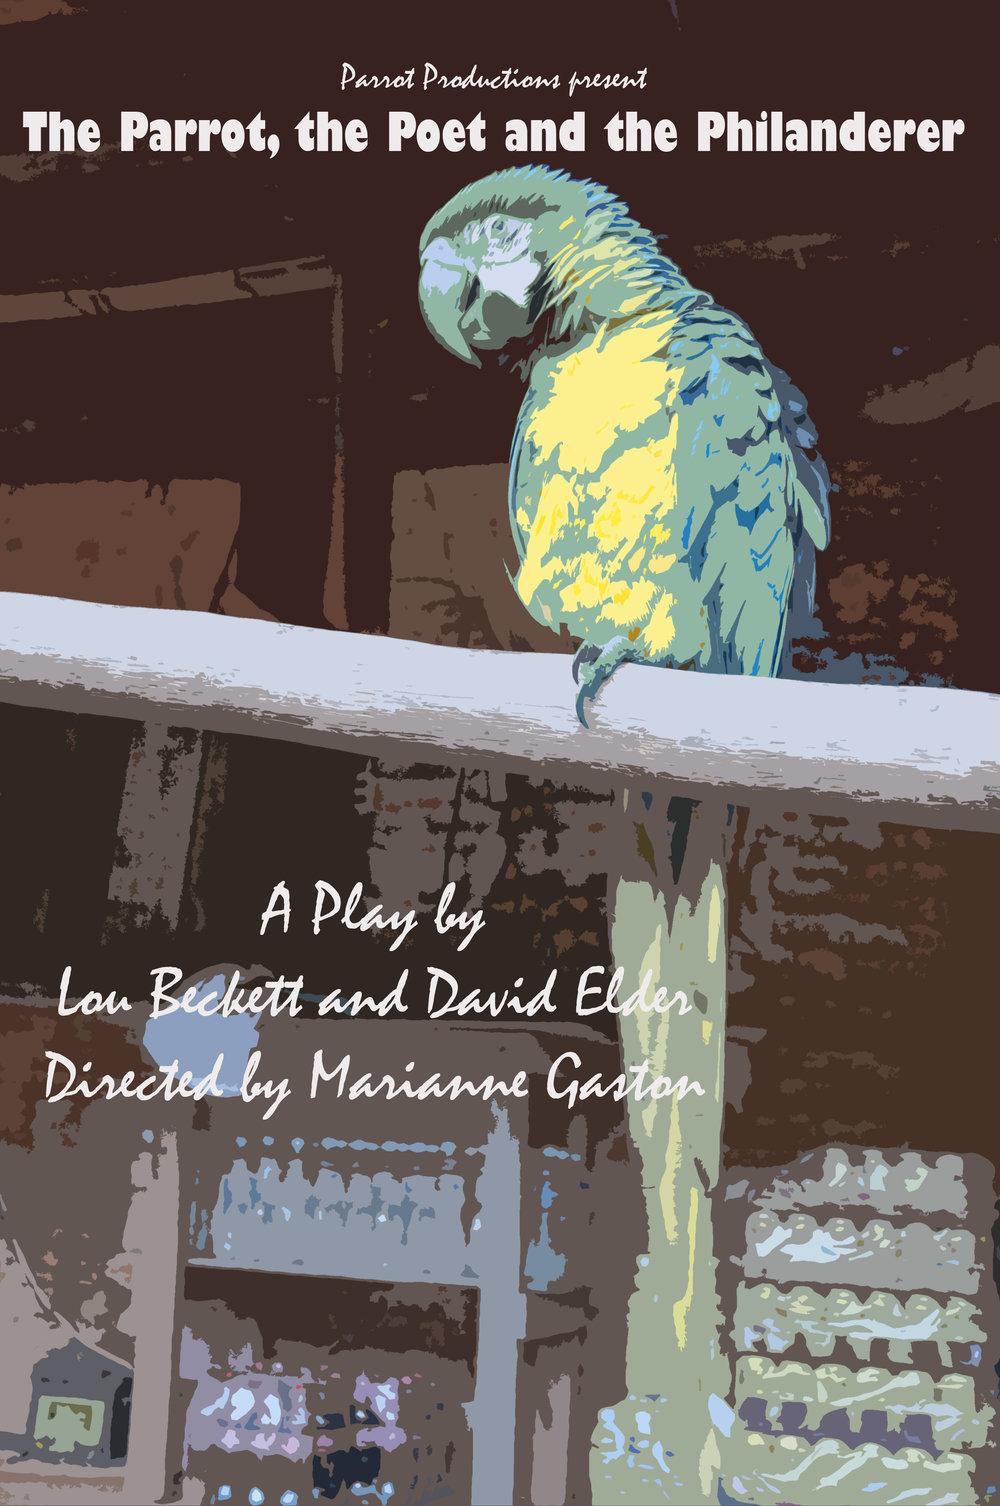 Parrot, Poet and Philanderer - programme cover.jpg